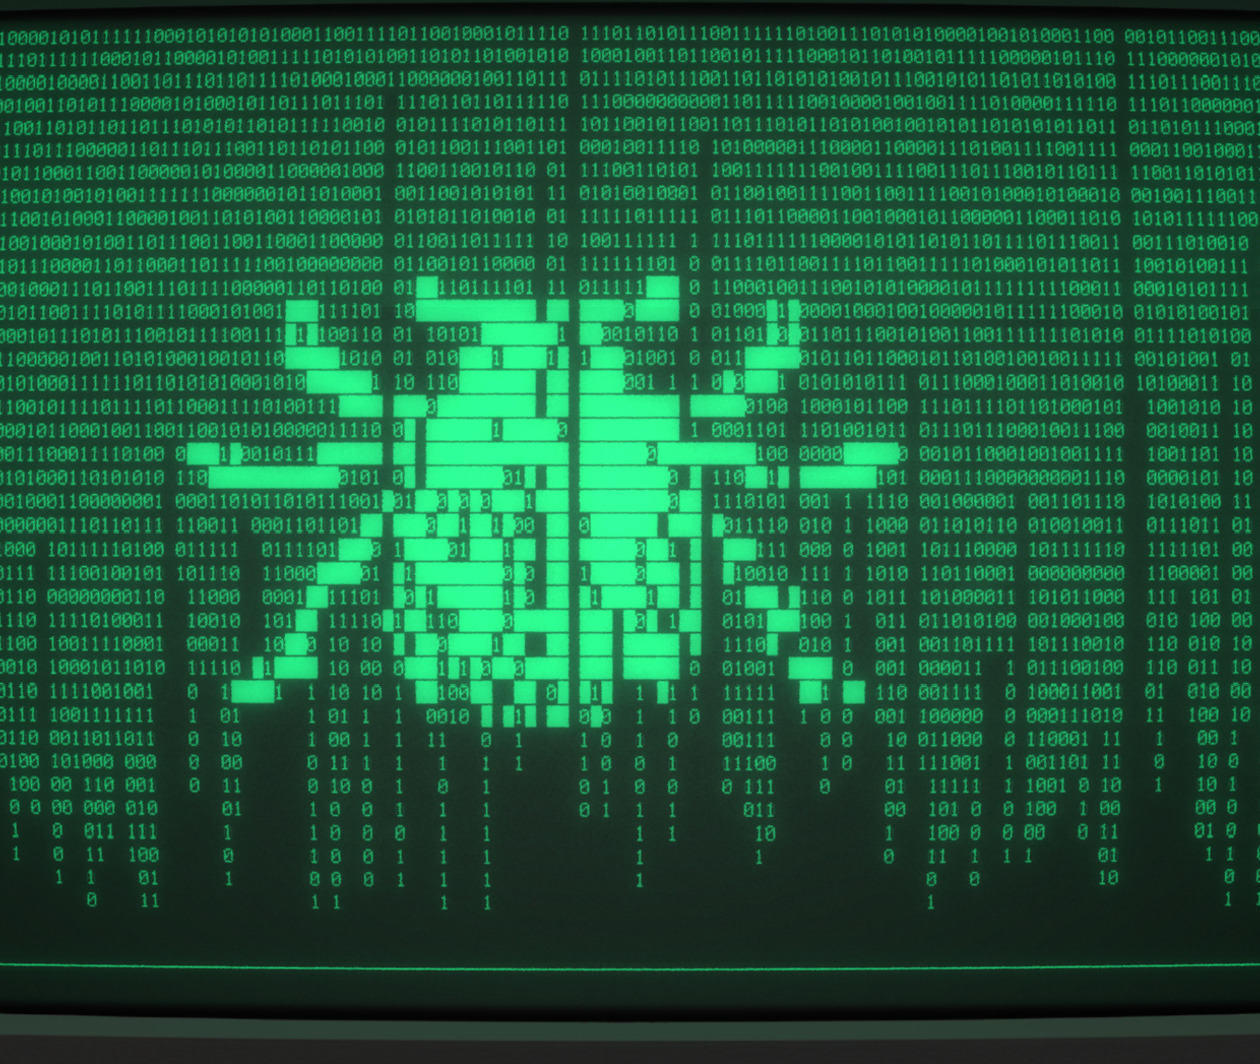 Defensive Programming and Debugging